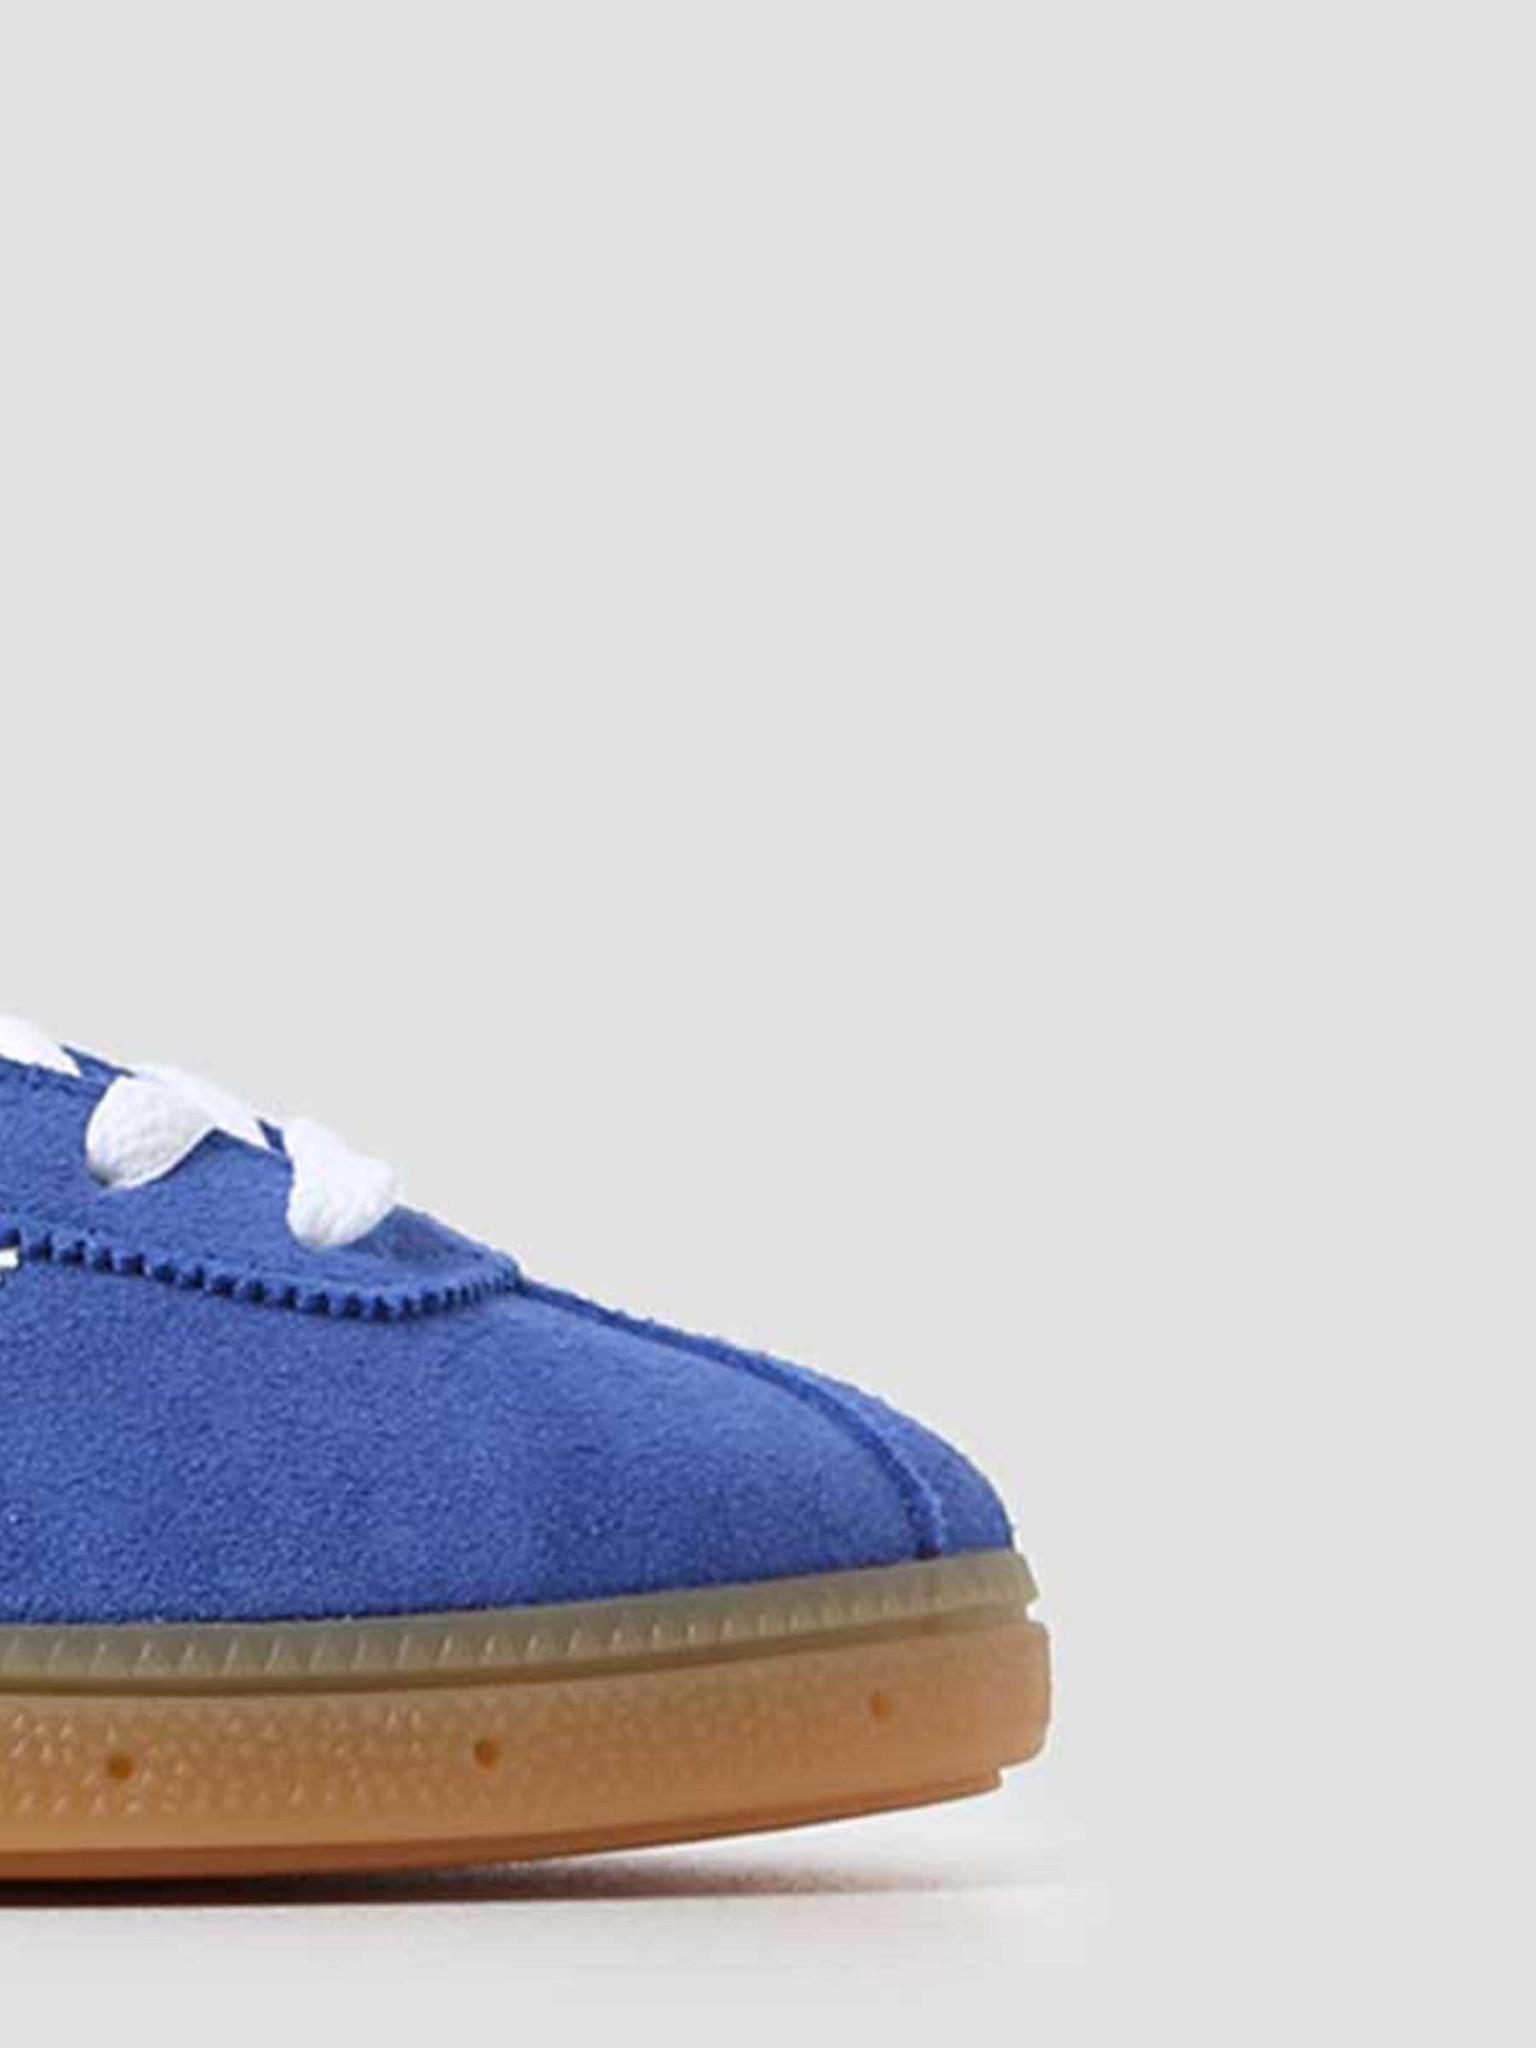 adidas adidas Munchen Royal Blue White Gum2 FV1190